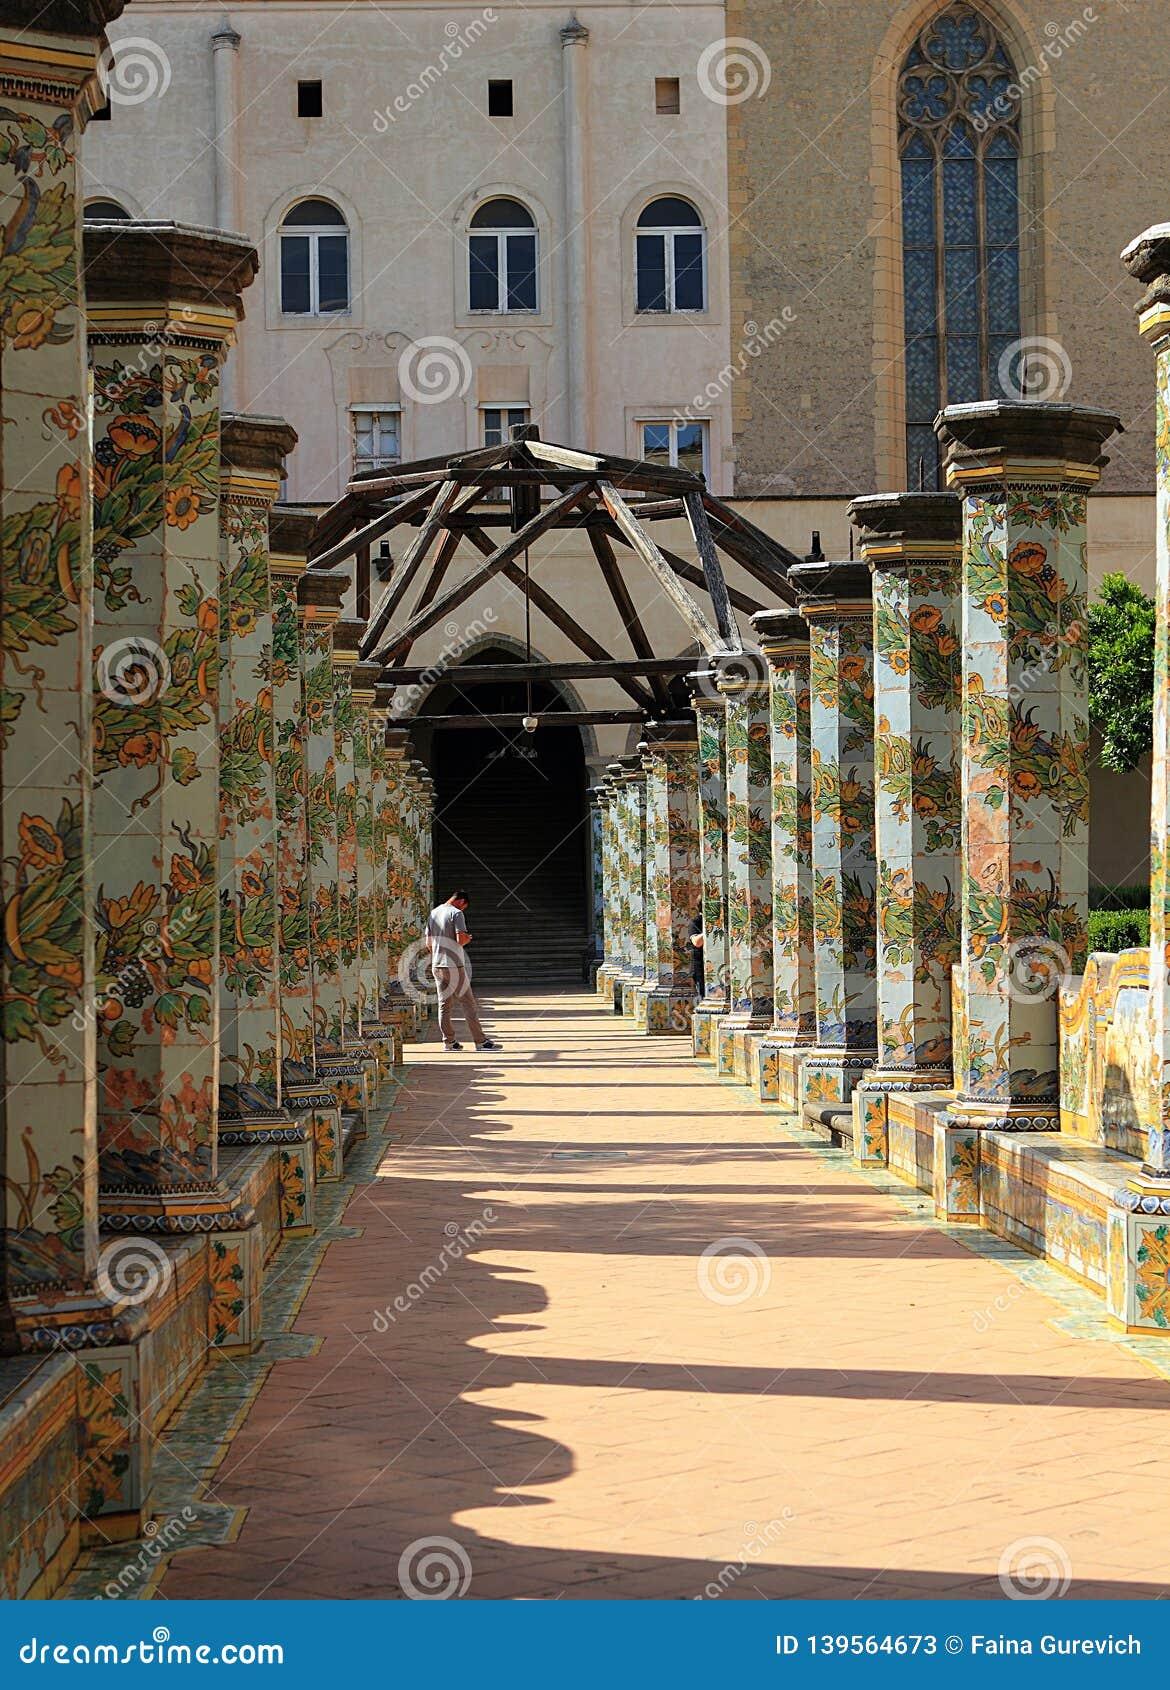 The ceramic decorations of the Santa Chiara Monastery cloister